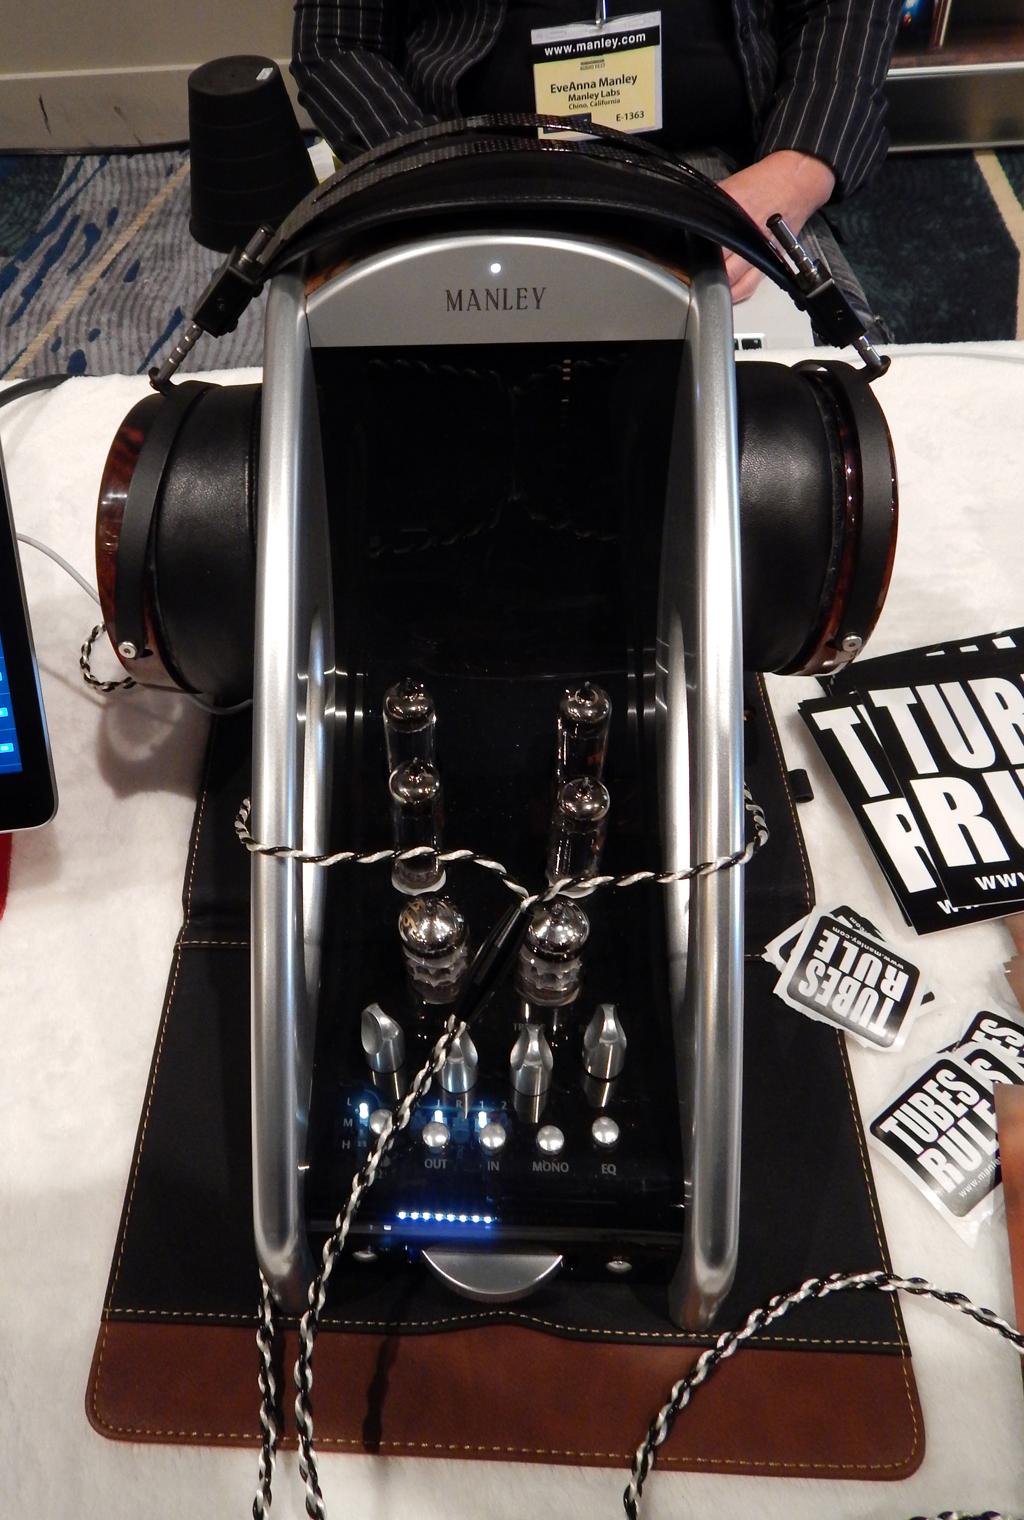 Manley Absolute Headphone Amplifier in Silver, Audeze LCD4 Headphones